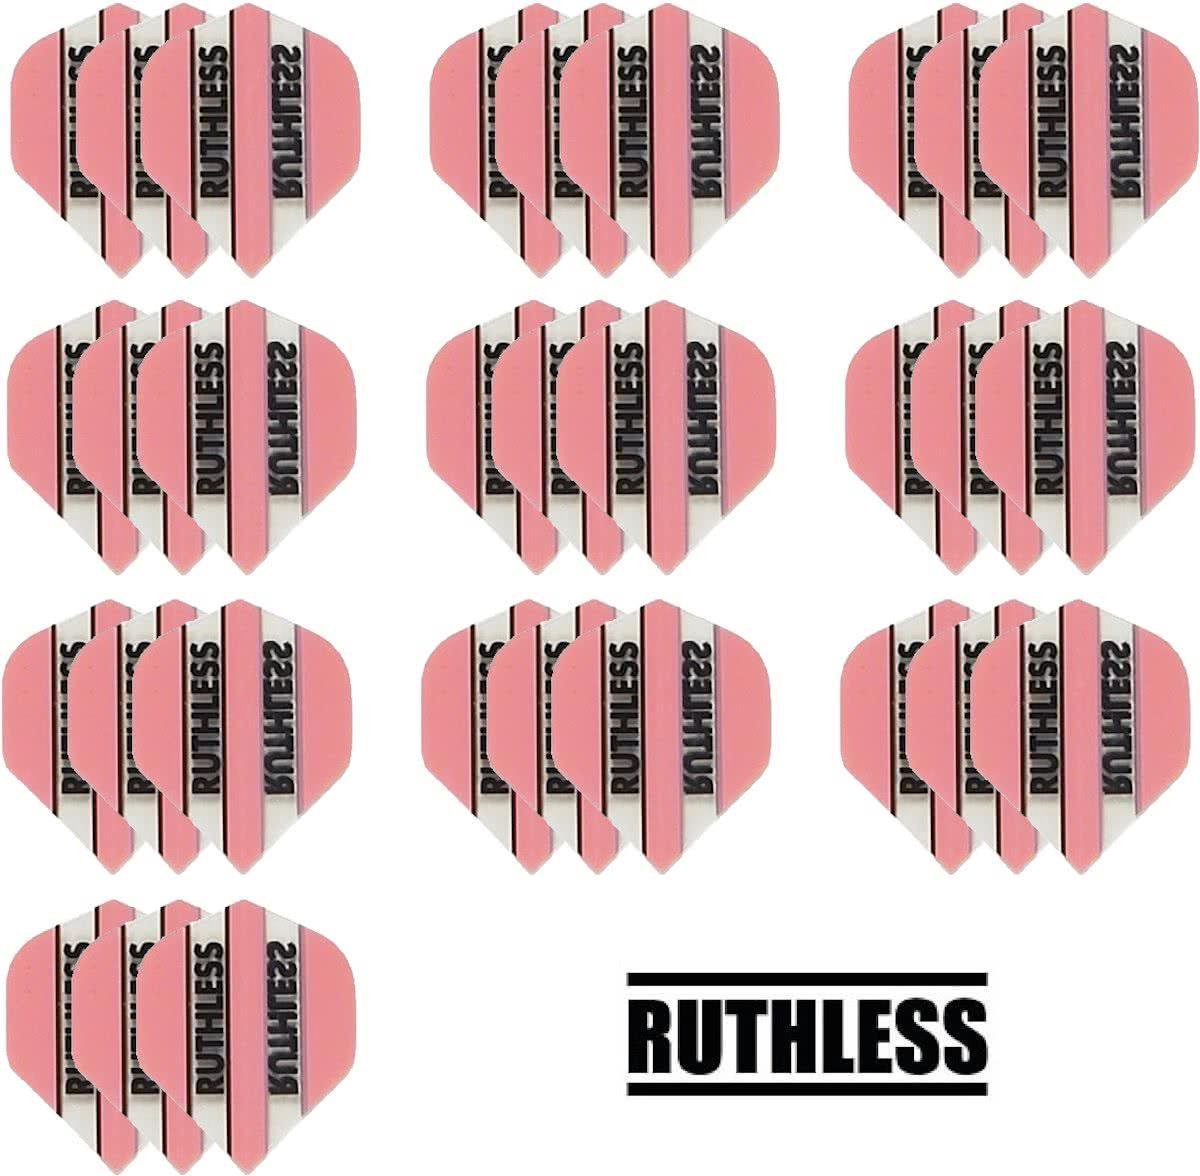 Dragon darts - 10 Sets (30 stuks) - Ruthless - sterke flights - Roze Panel - darts flights